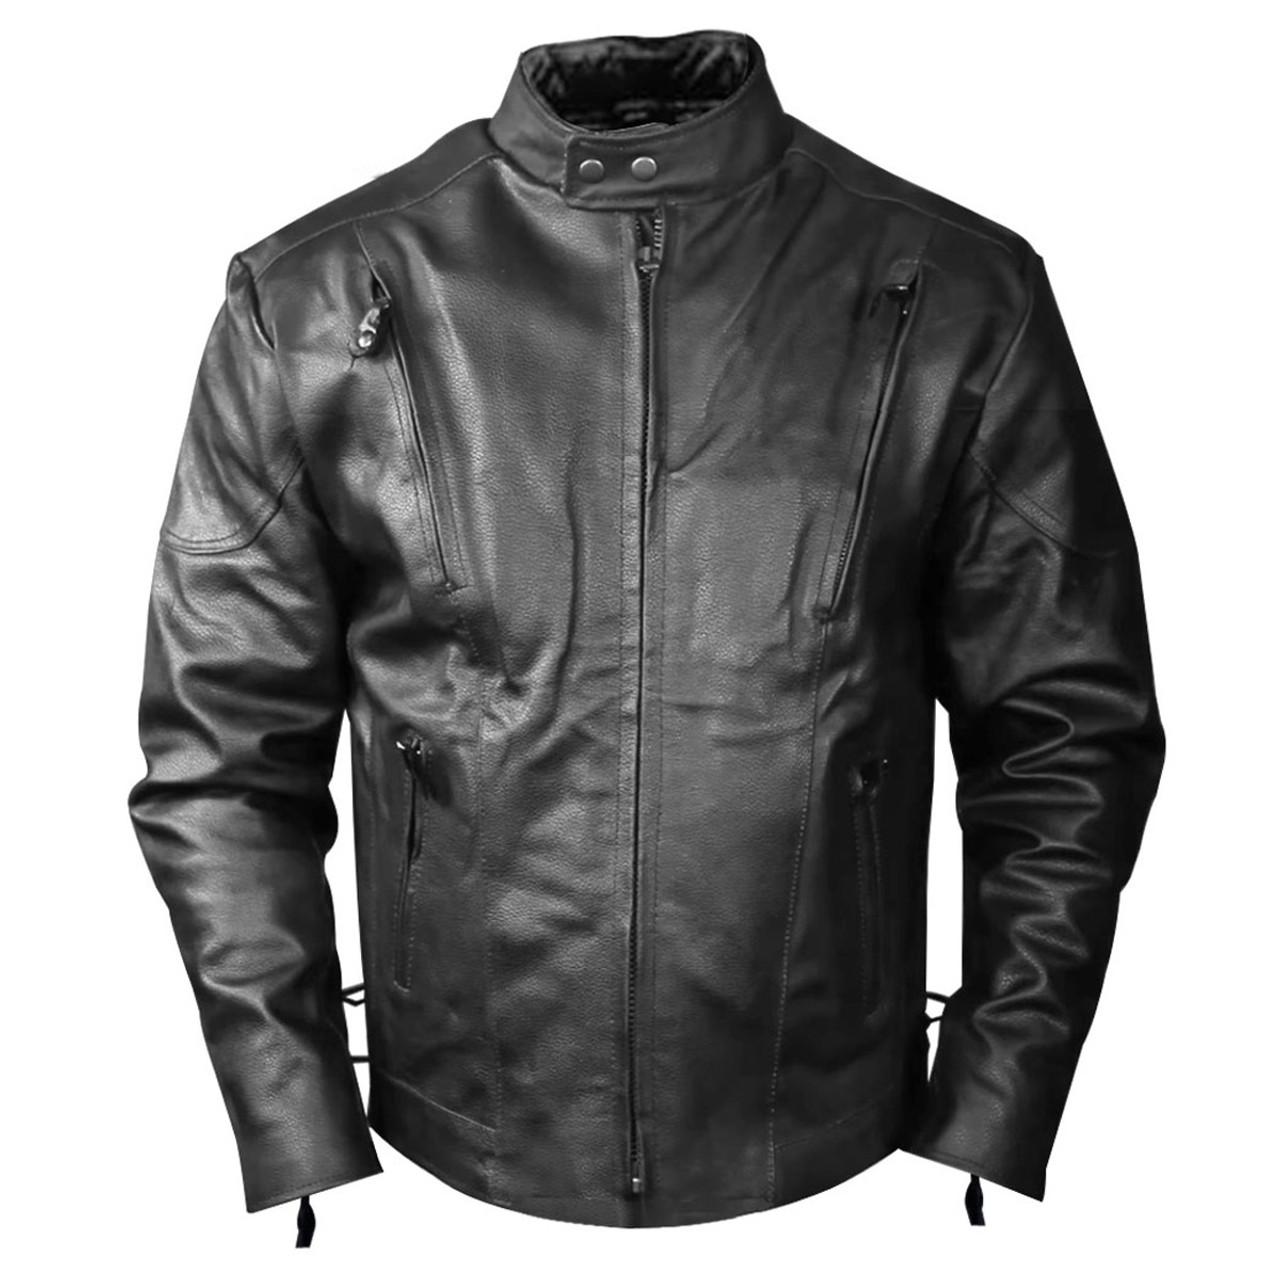 New Leather Motorcycle Cowhide Jacket Slim Fit Coat LTC597 XXXS Black